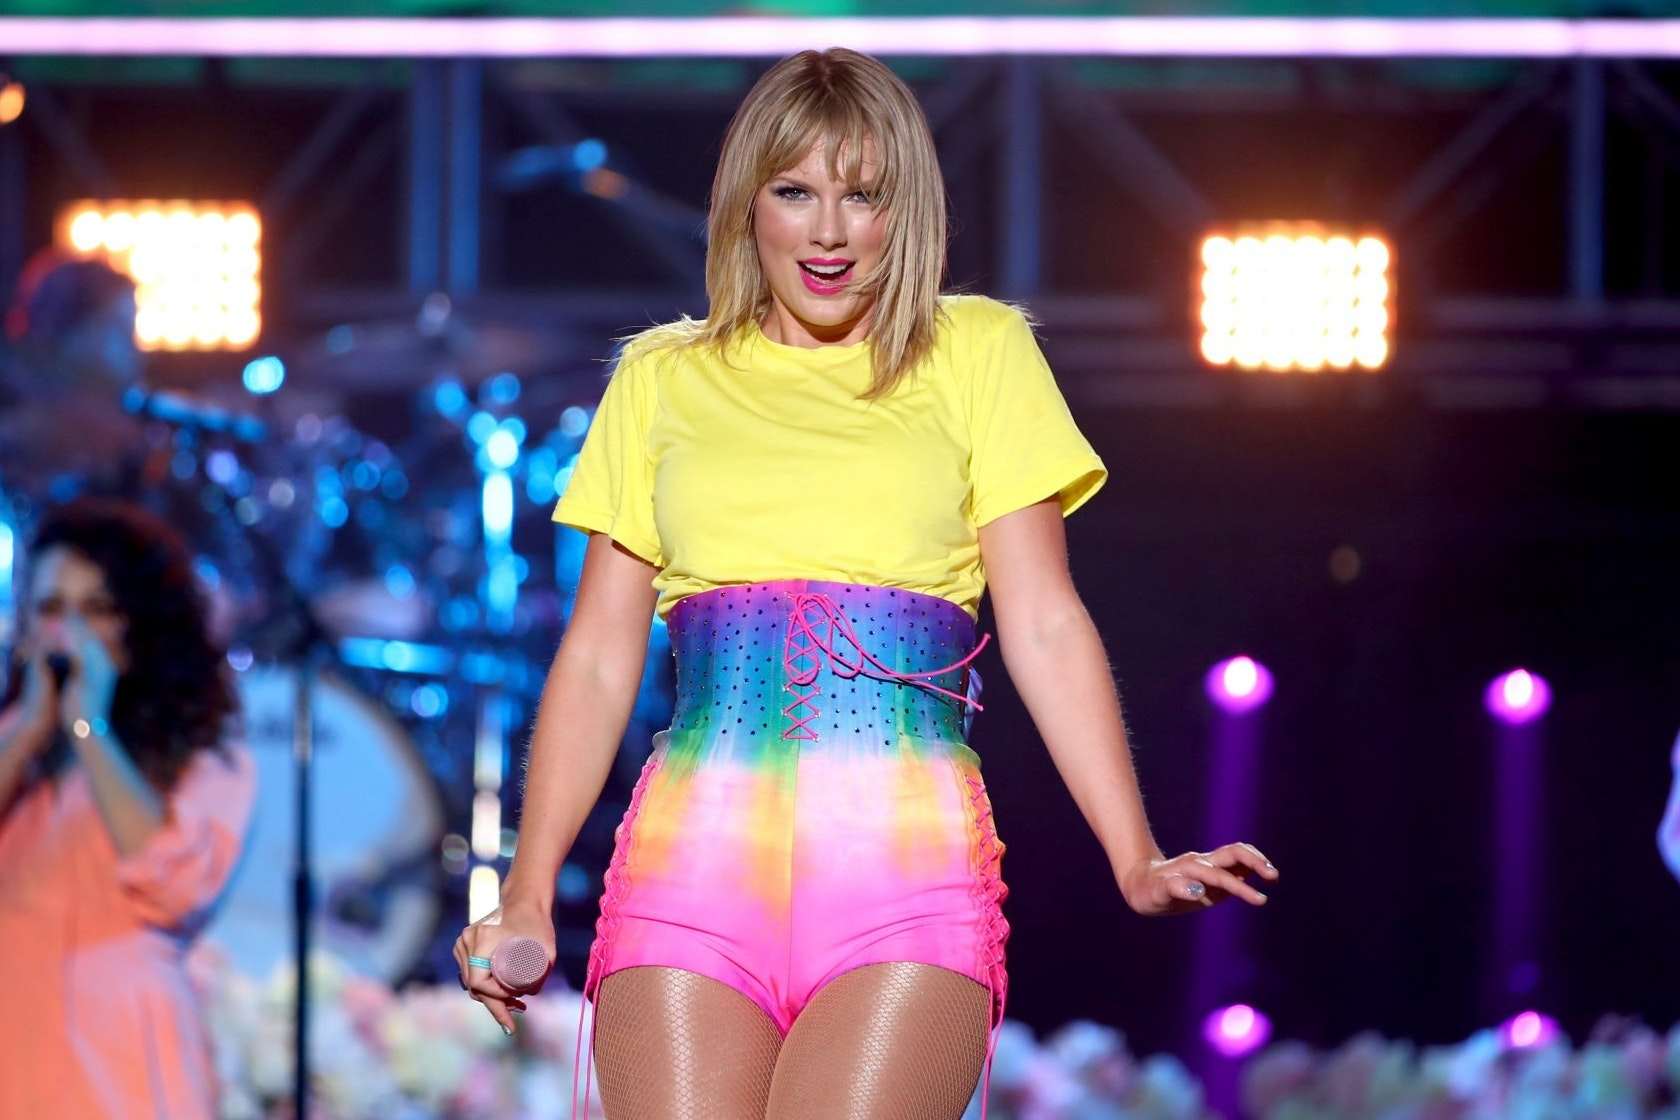 Taylor Swift and Stella McCartney fashion collaboration